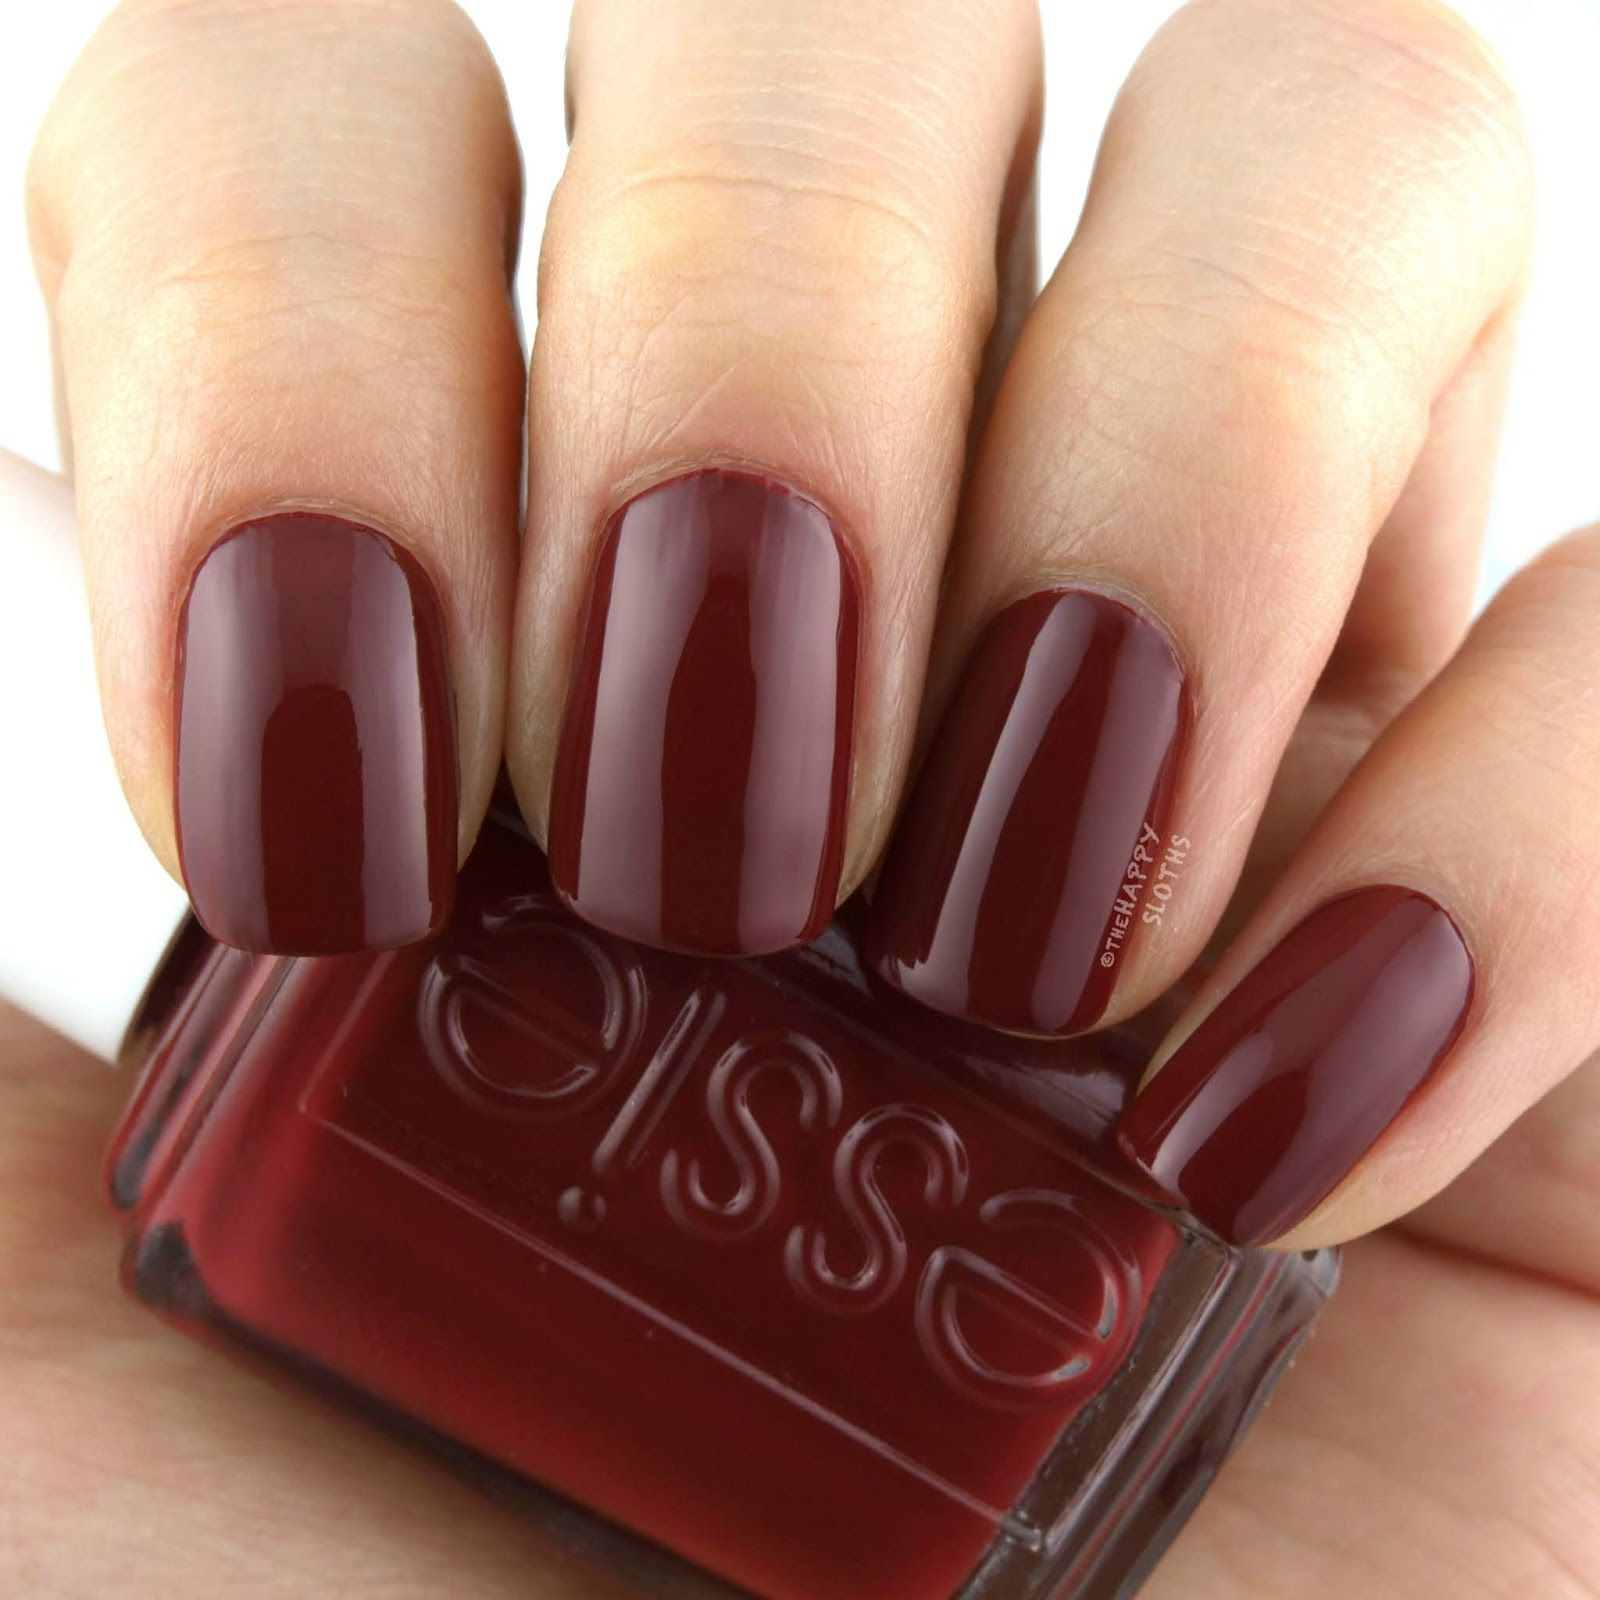 Essie   Nails   Essie nail polish colors, Essie colors, Nails